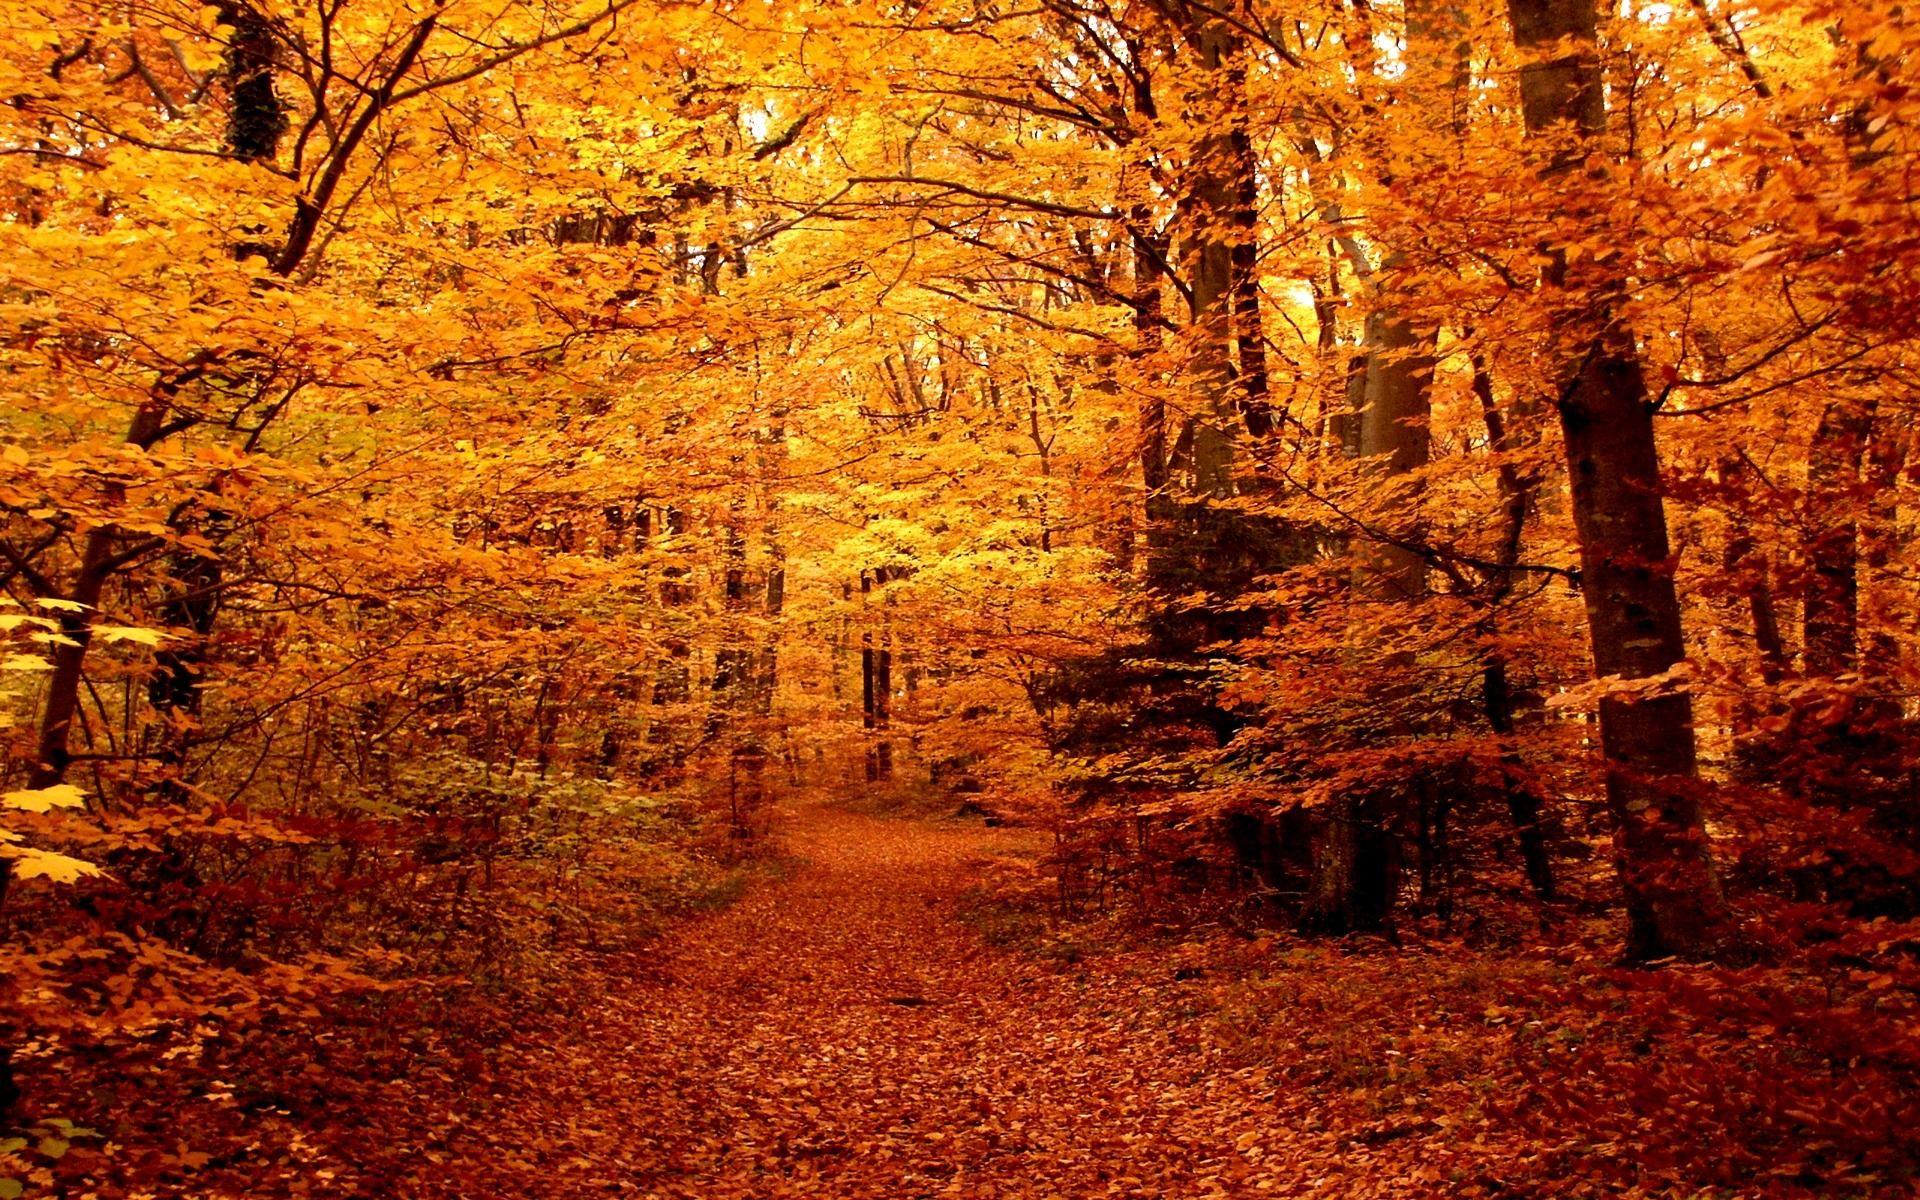 autumn path | HD Autumn Forest Path Wallpaper | Autumn | Pinterest ...